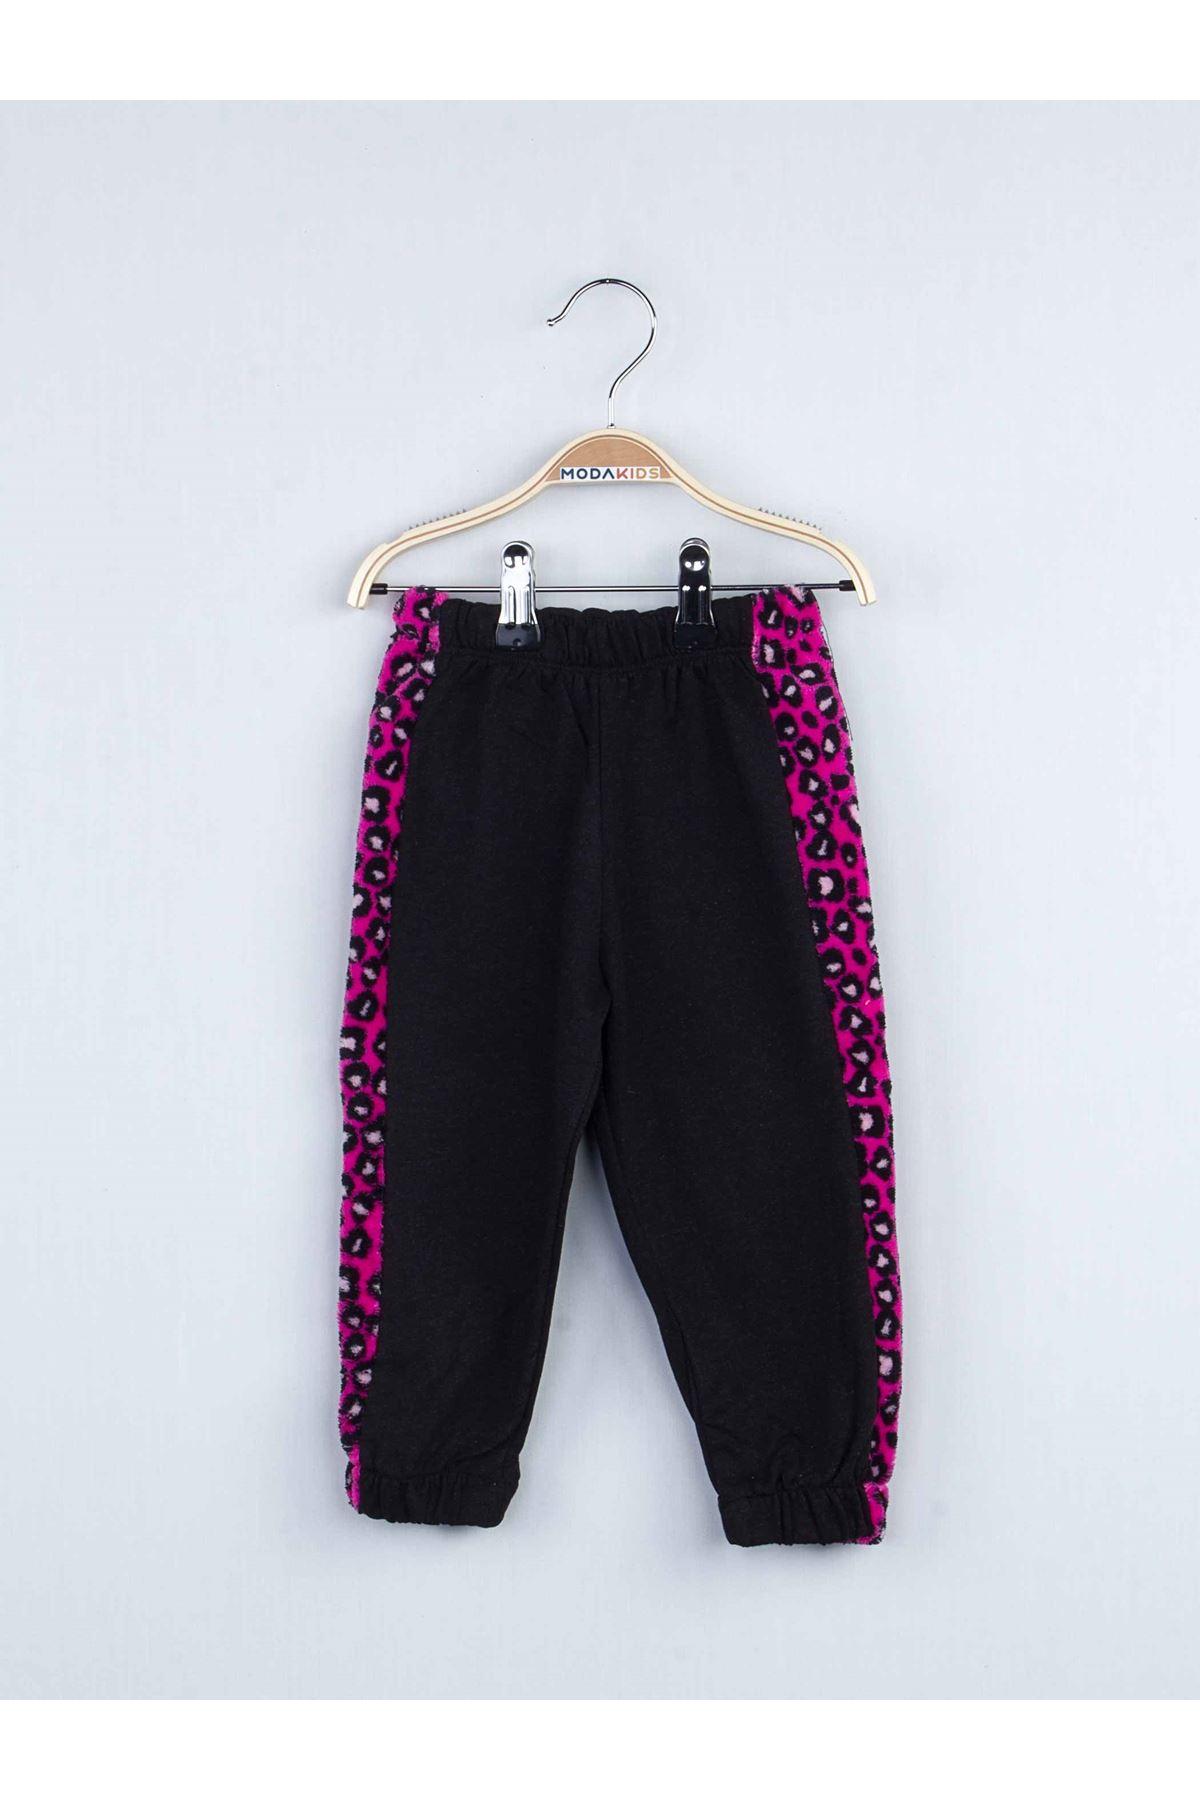 Black Boys Girls Track suit Set Bottom Pajamas Top Pajamas Kids Daily Wear Homewear Cotton Comfortable Children Pajamas Sets